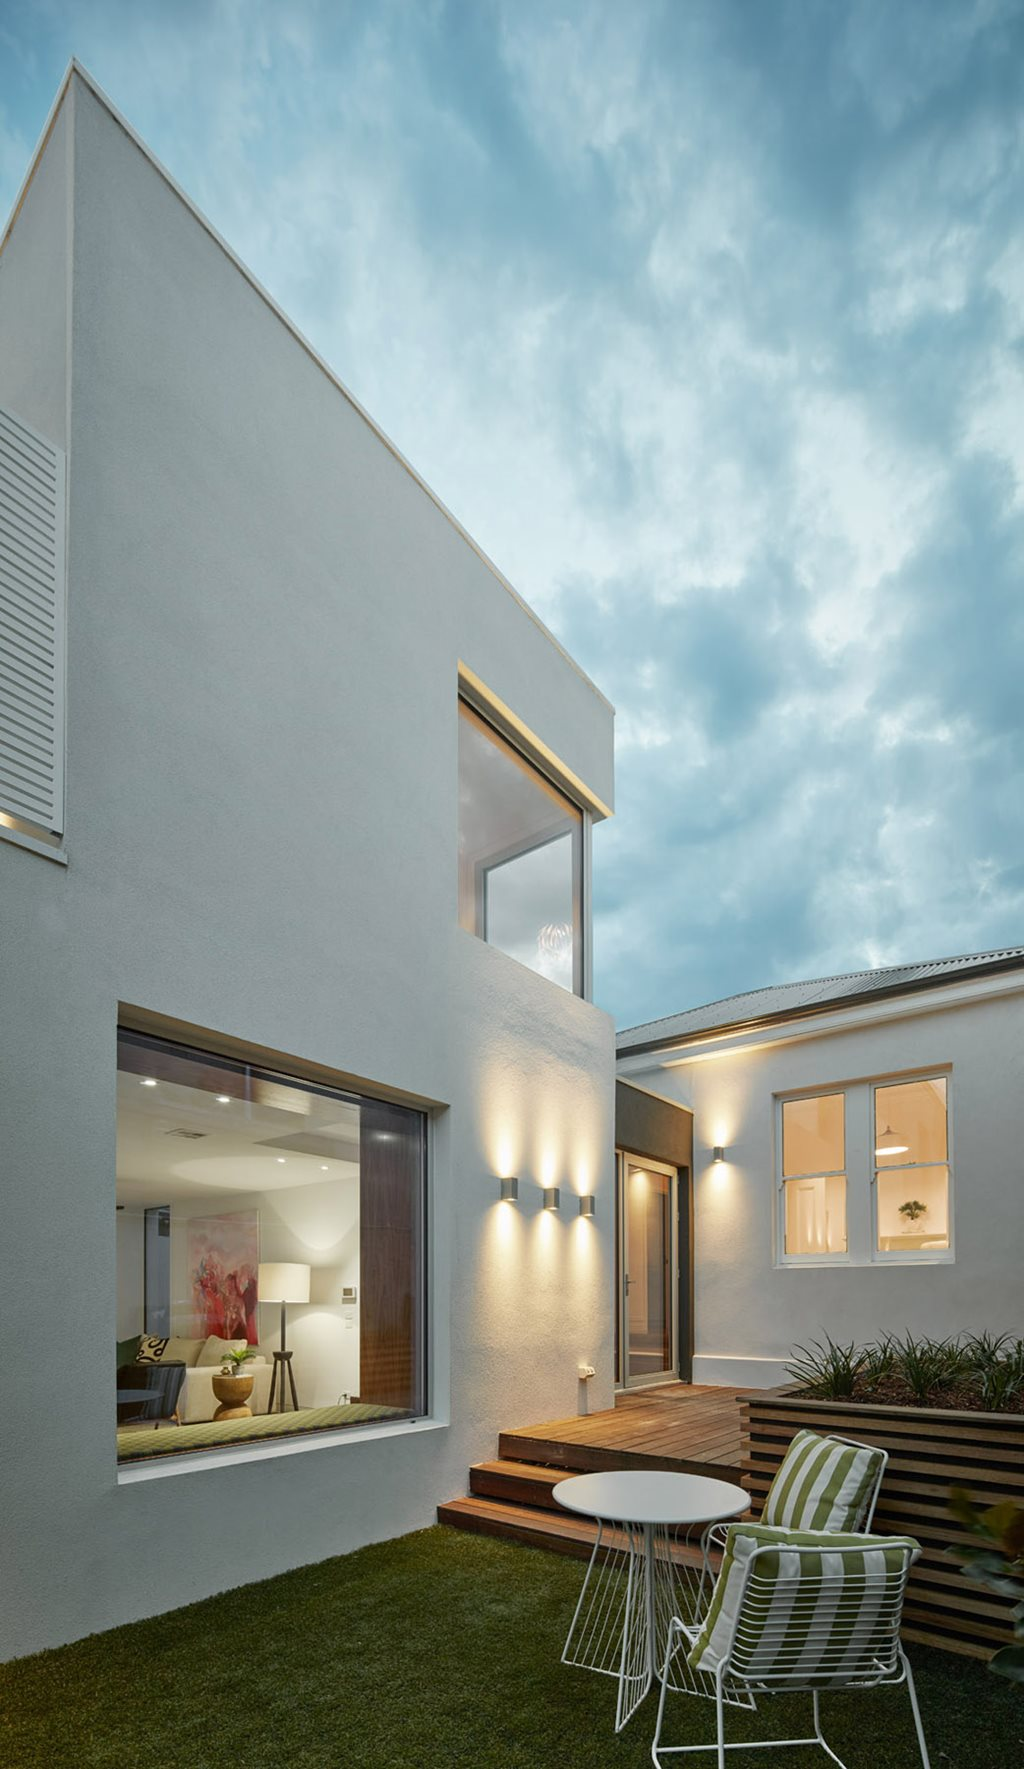 Waltham jewel by melbourne design studios architecture for Melbourne design studios